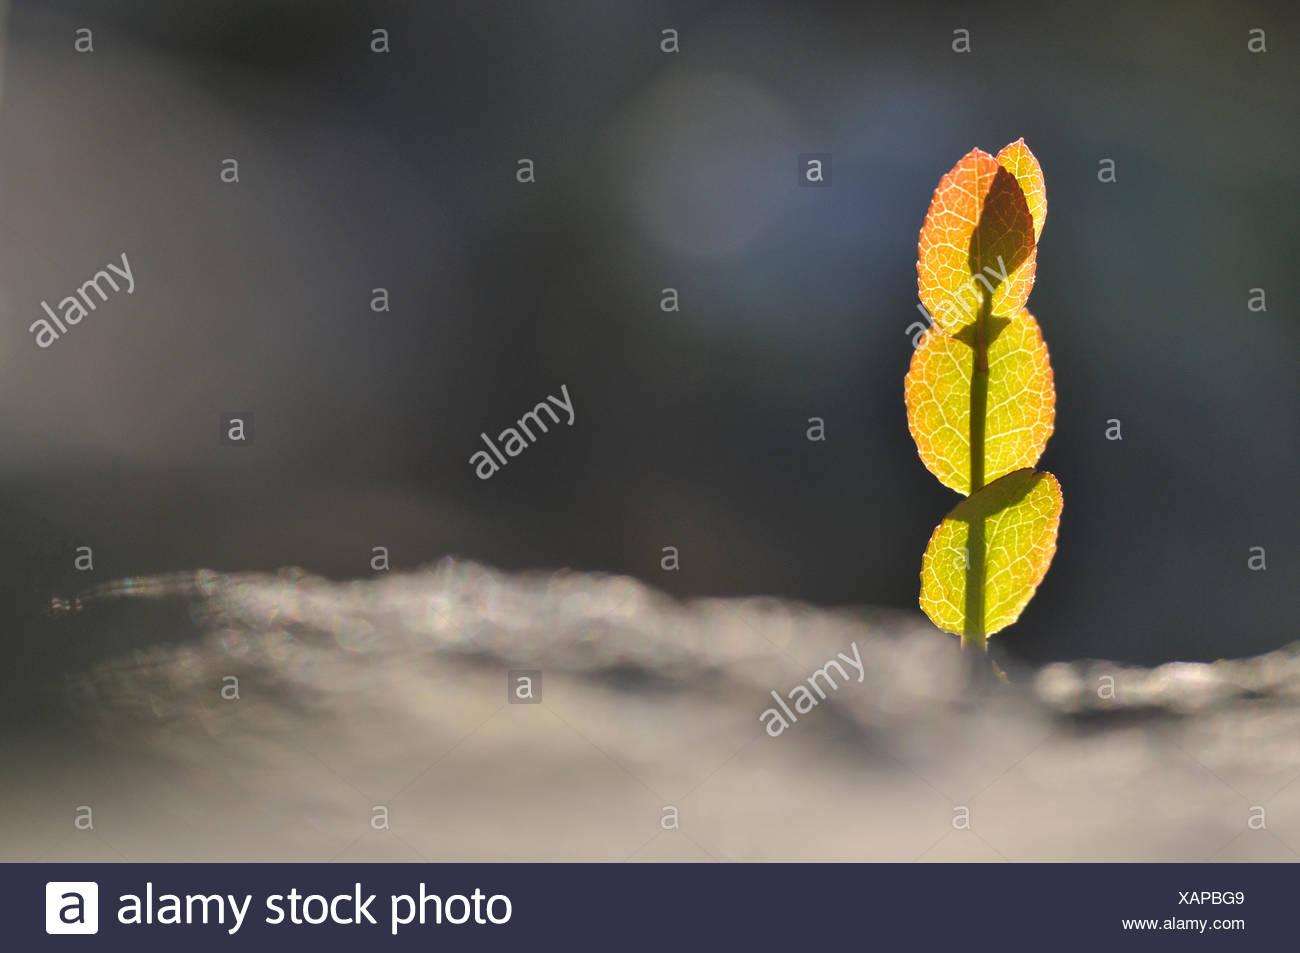 color image Dalarna horizontal leaf nature Scandinavia Sweden - Stock Image